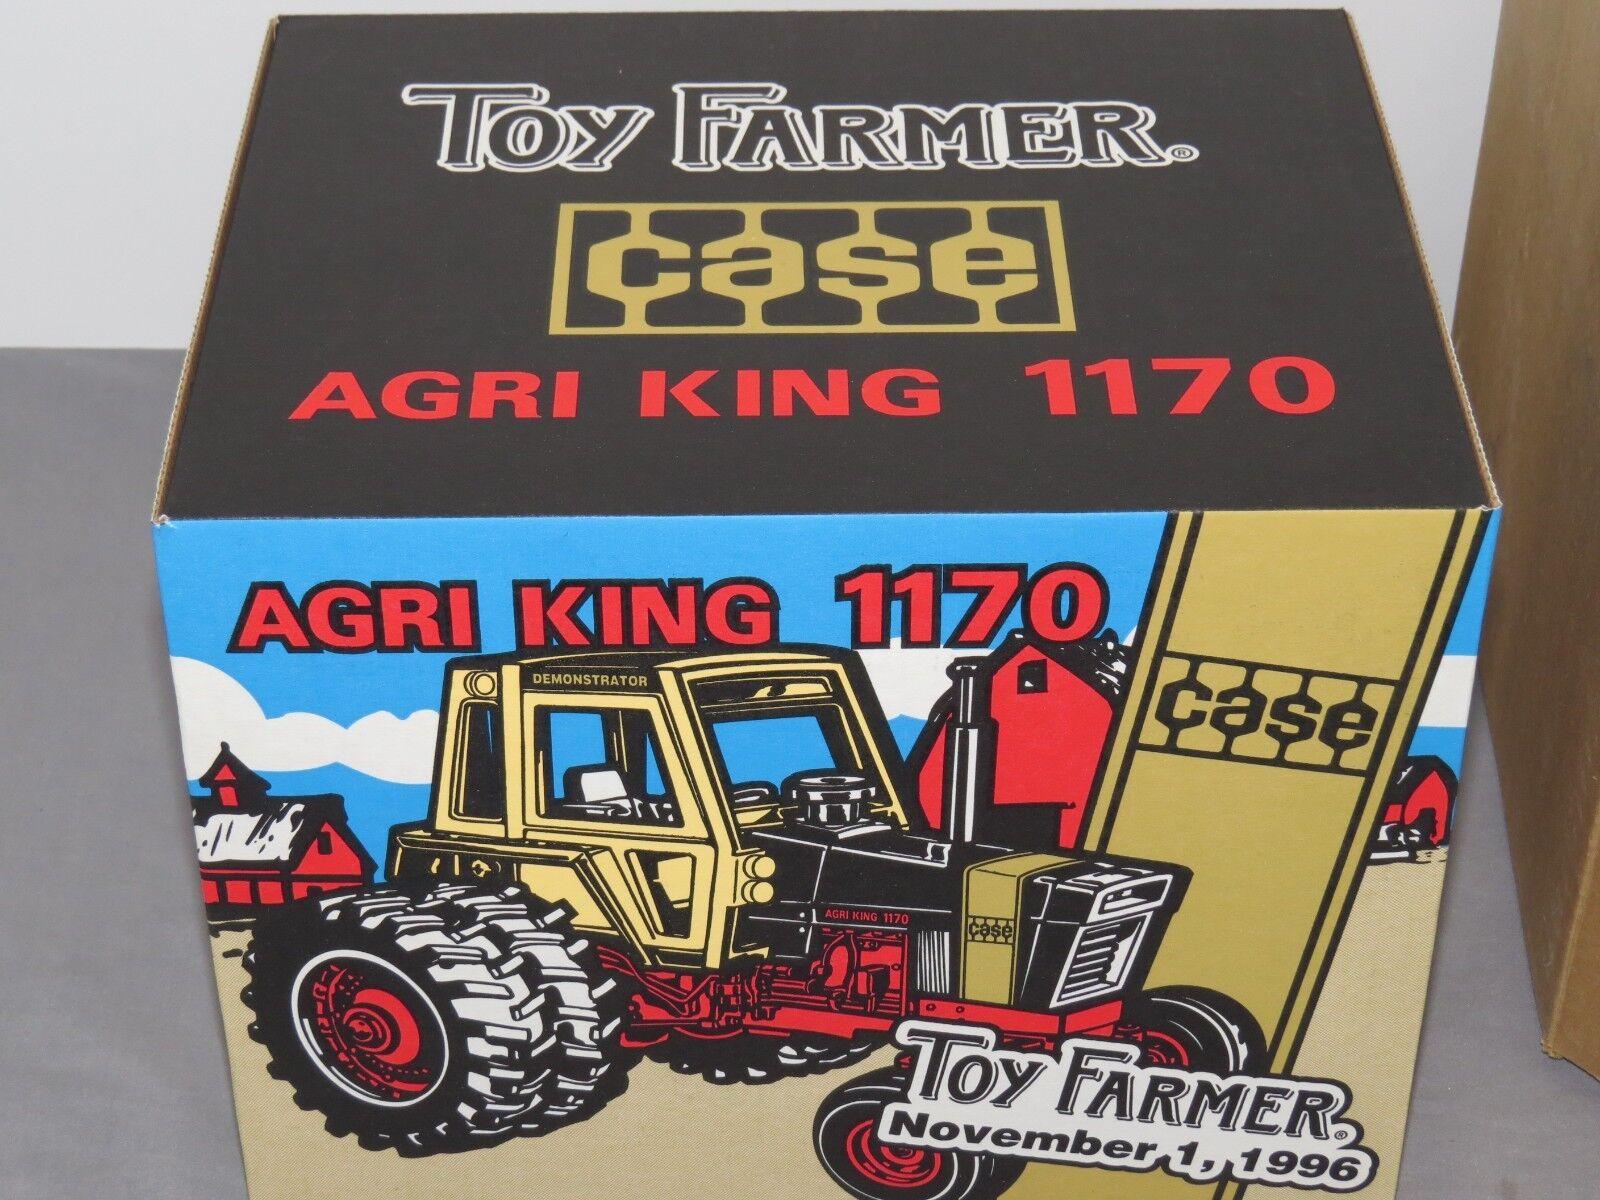 Vintage 1 16 Case Agri King 1170 Tractor Toy Farmer NIB Ertl gold Demonstrator